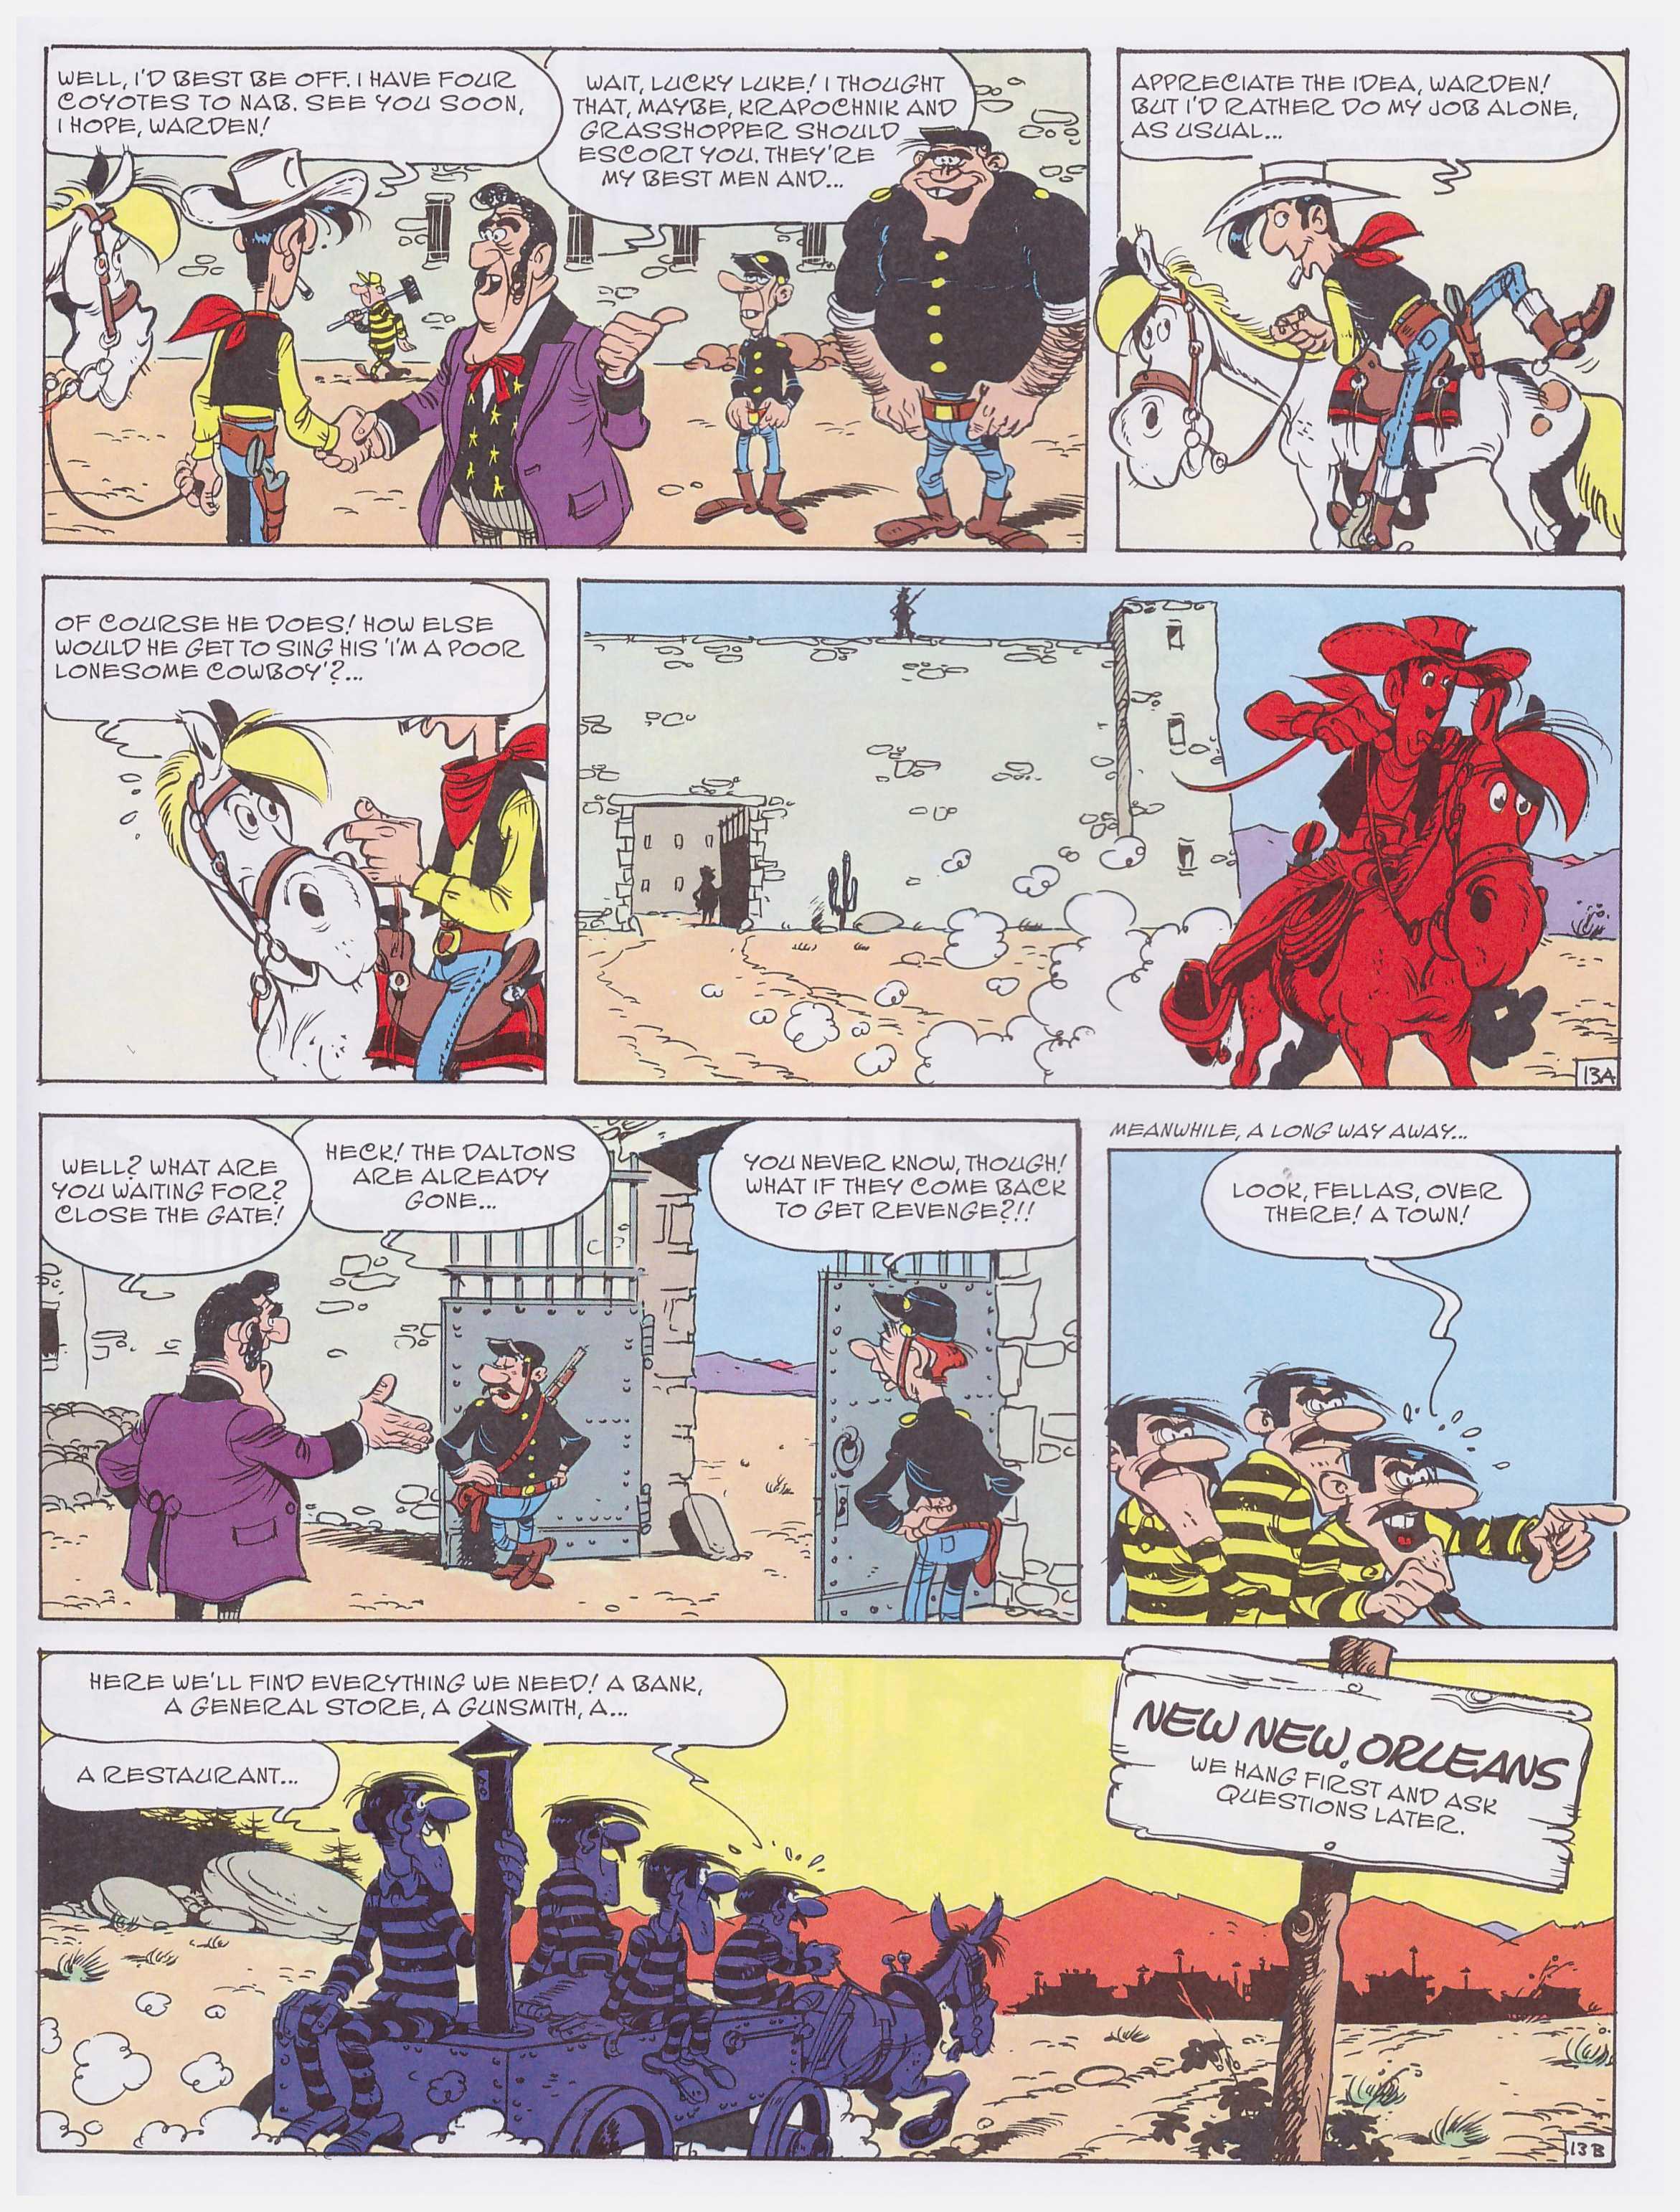 Lucky Luke the Daltons' Stash review